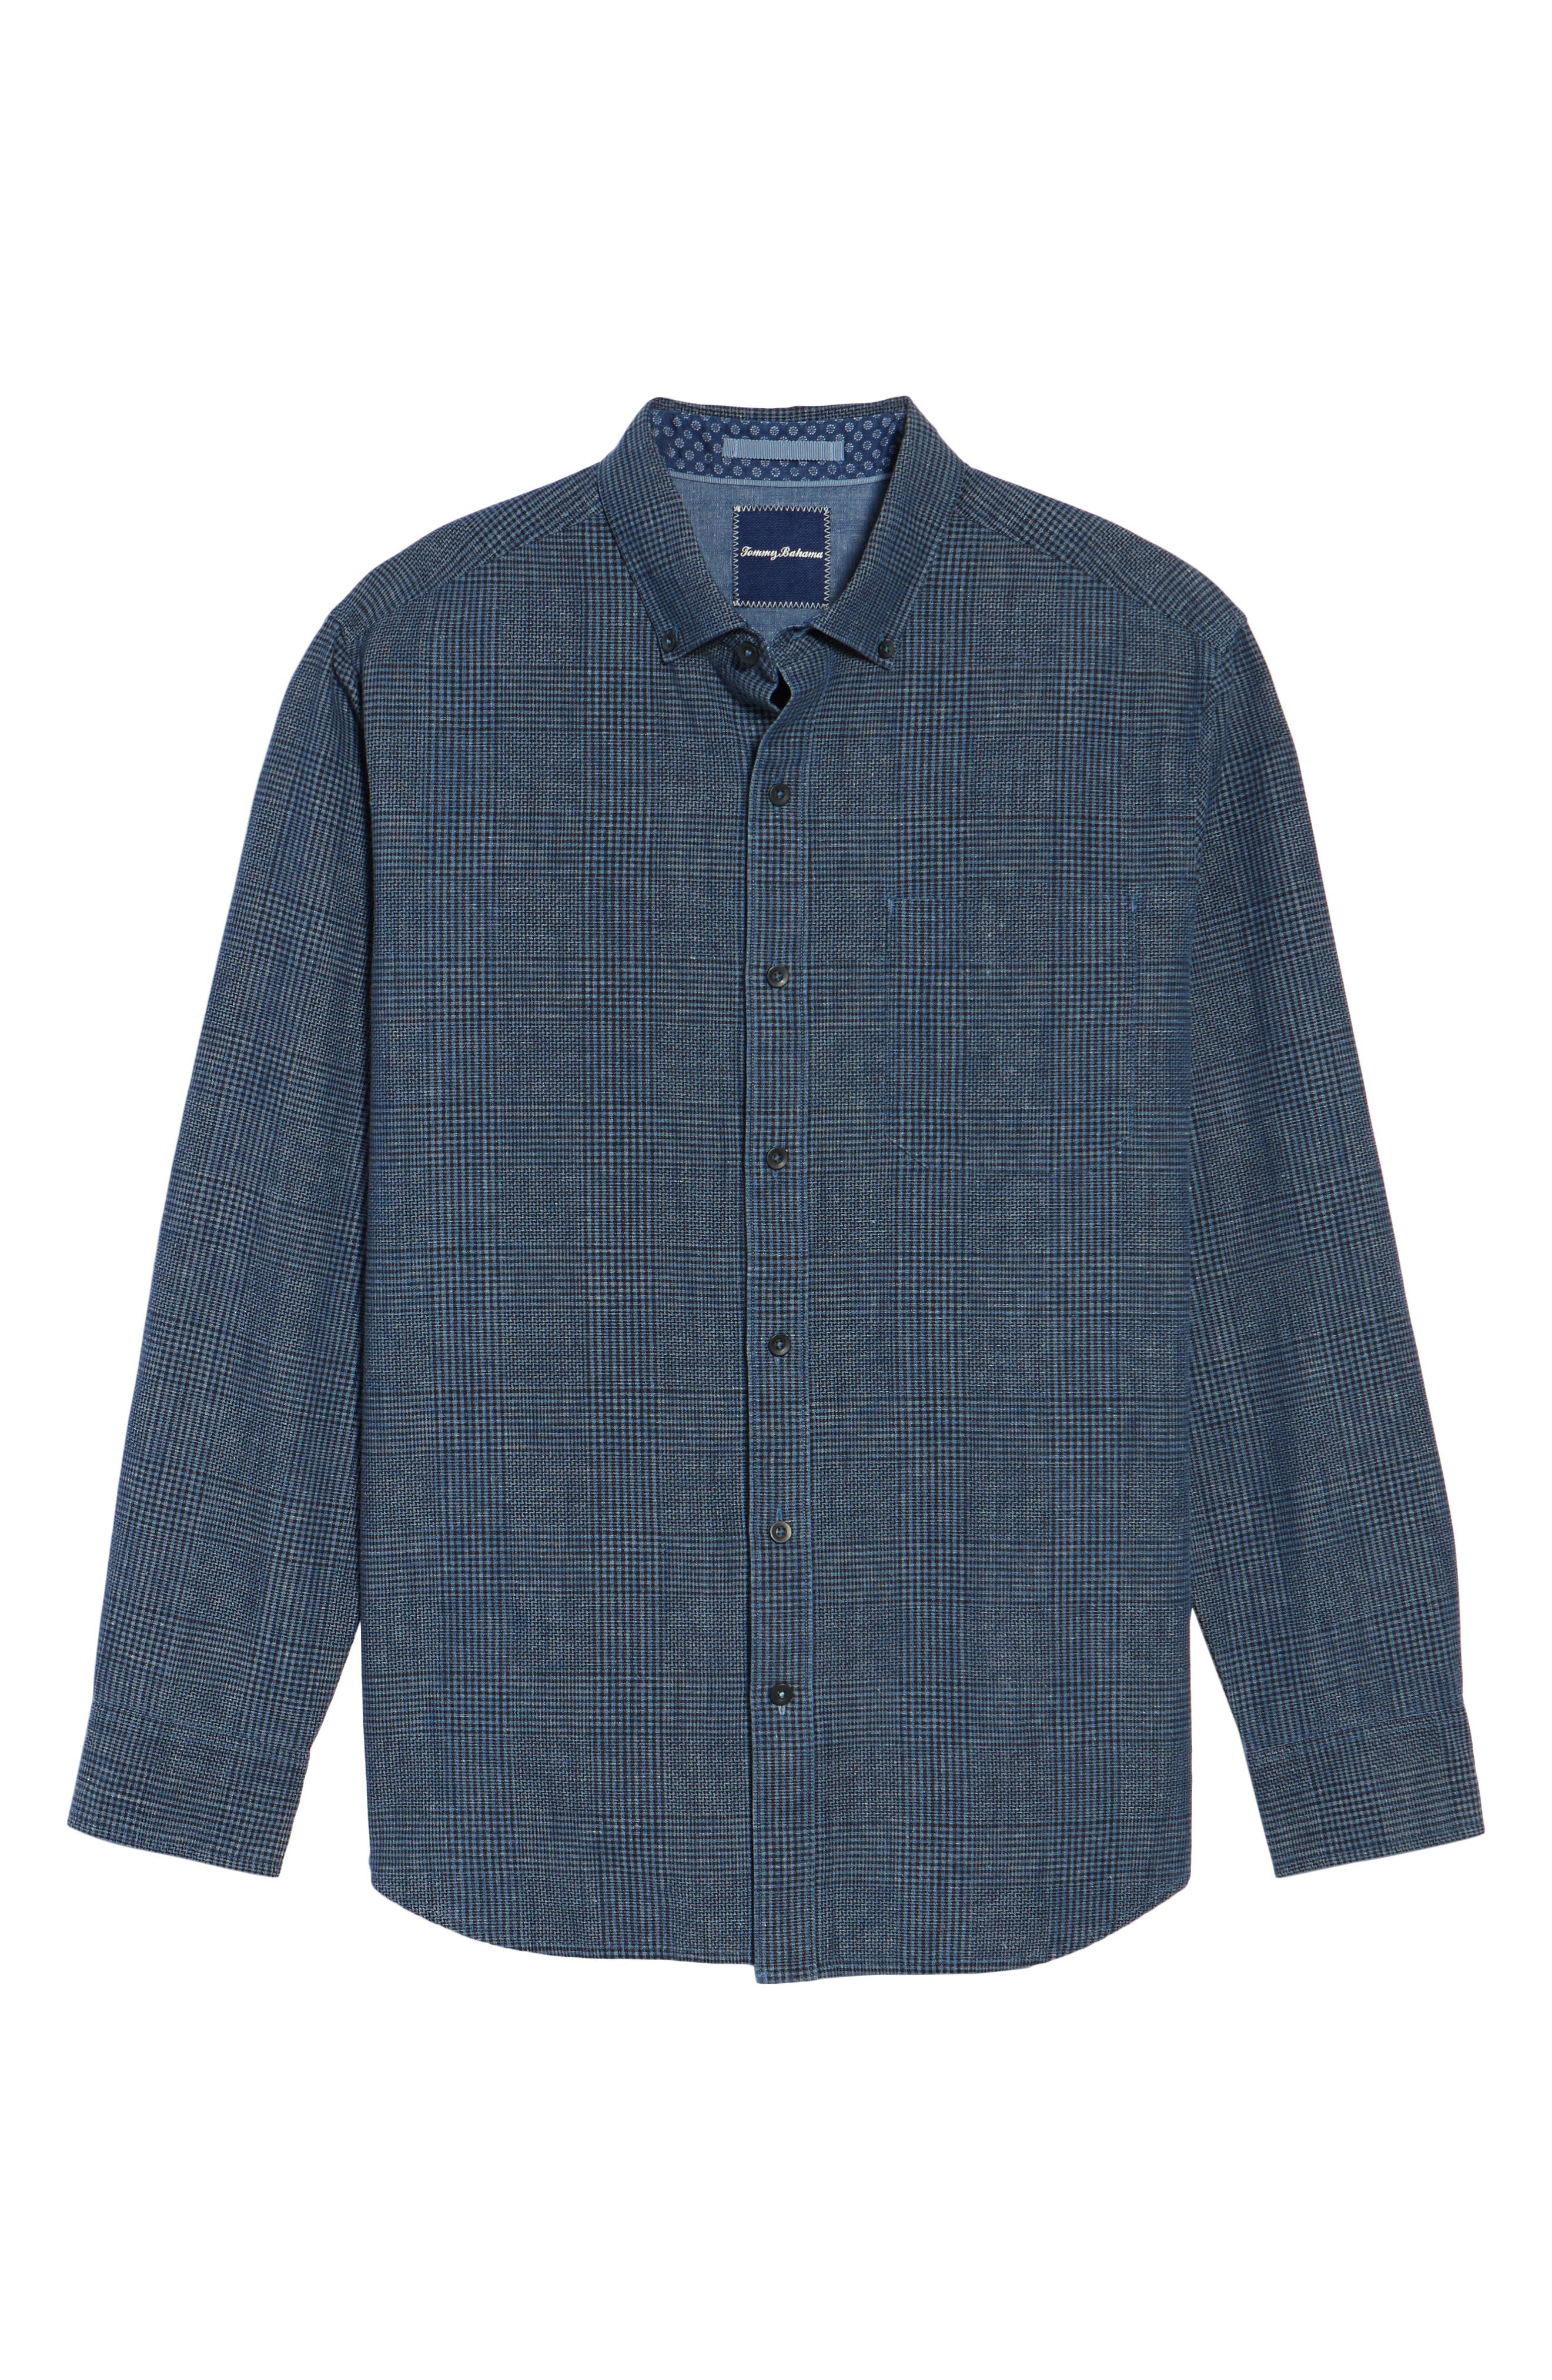 Almeria Standard Fit Plaid Sport Shirt,                             Alternate thumbnail 6, color,                             400